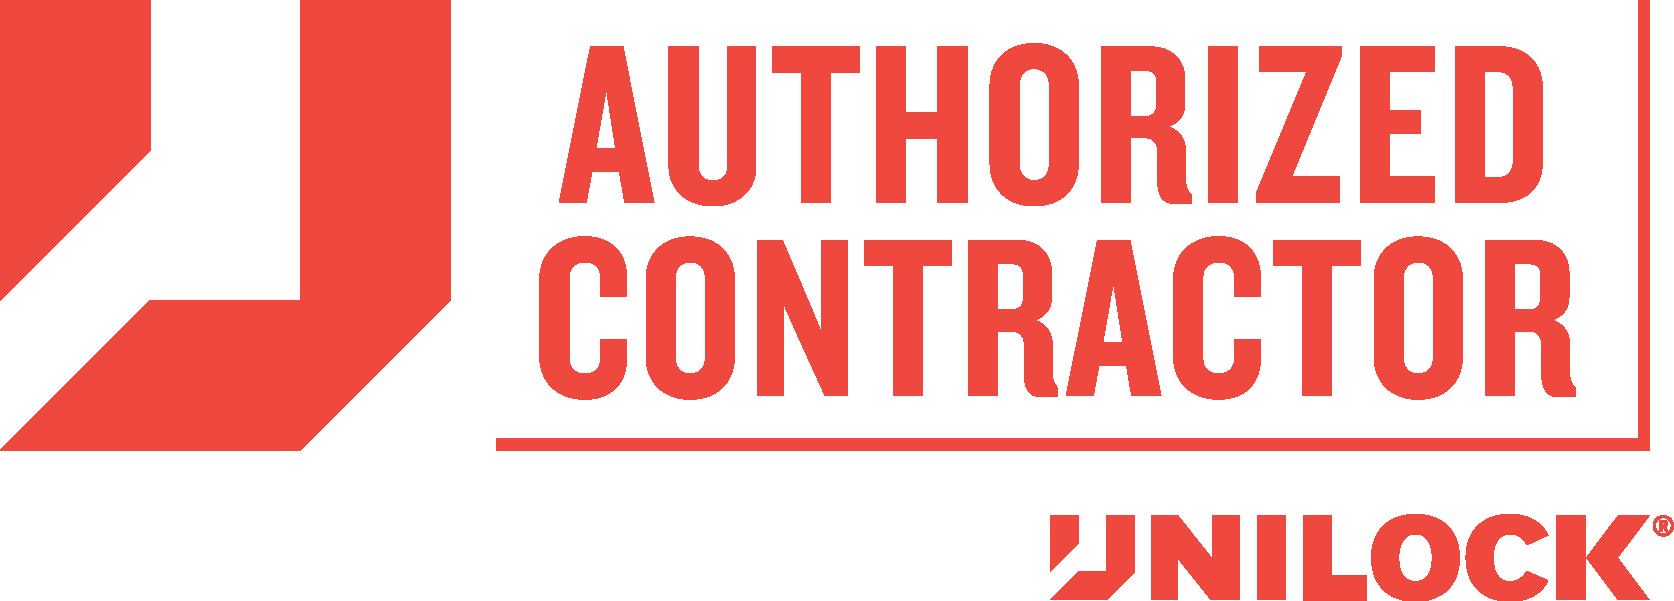 Unilock Authorized Contractor in Bergen County, NJ